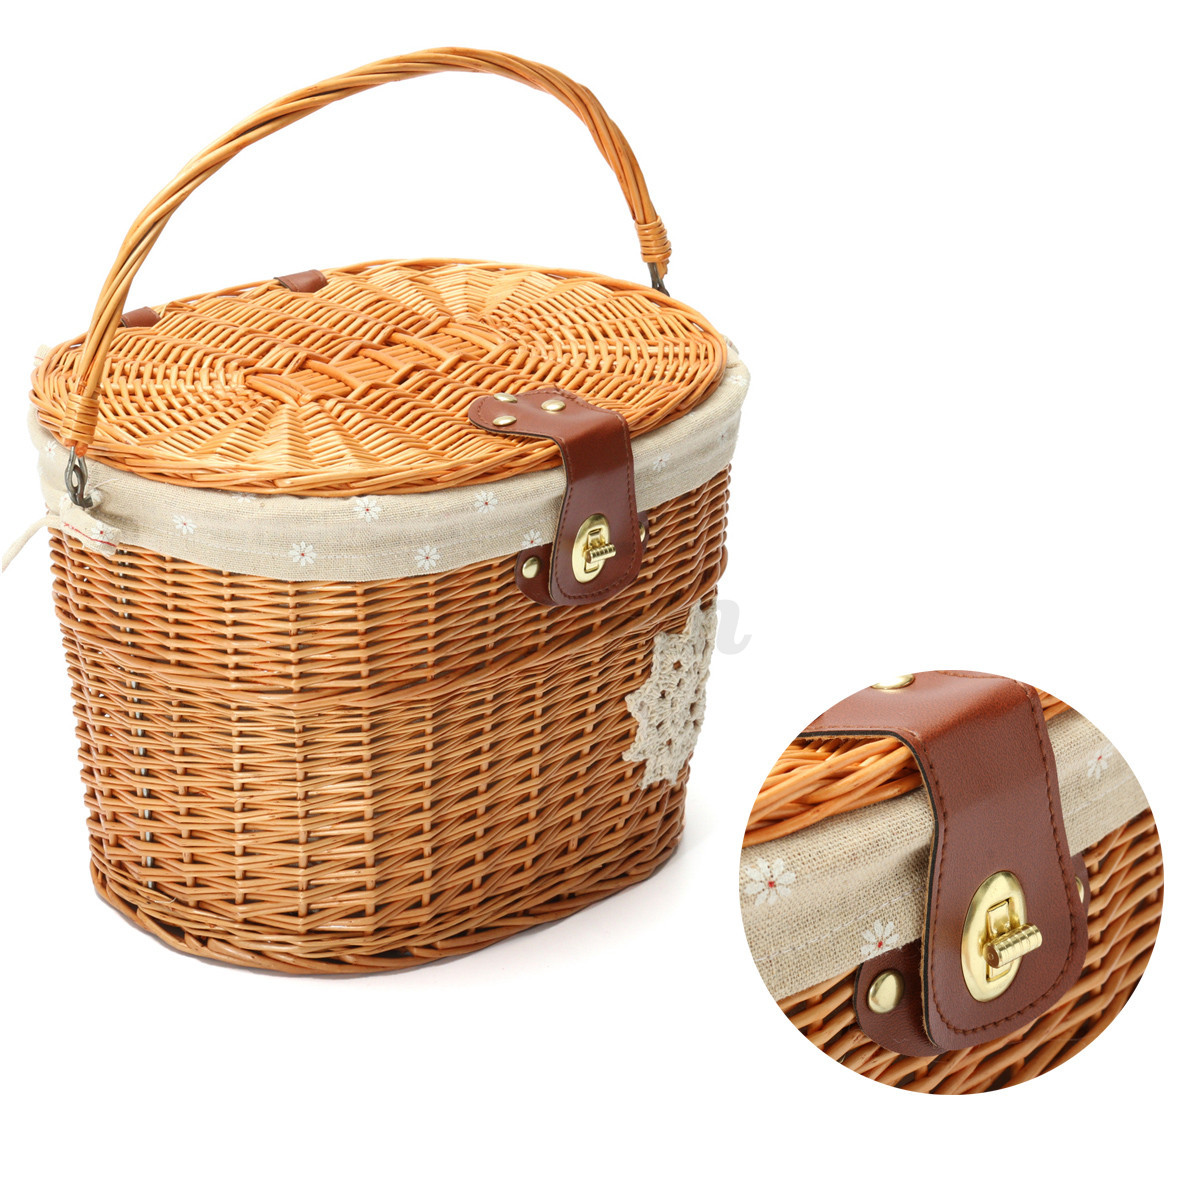 Wicker Bike Basket With Handle : Wicker bicycle bike front basket handlebar hook with lid